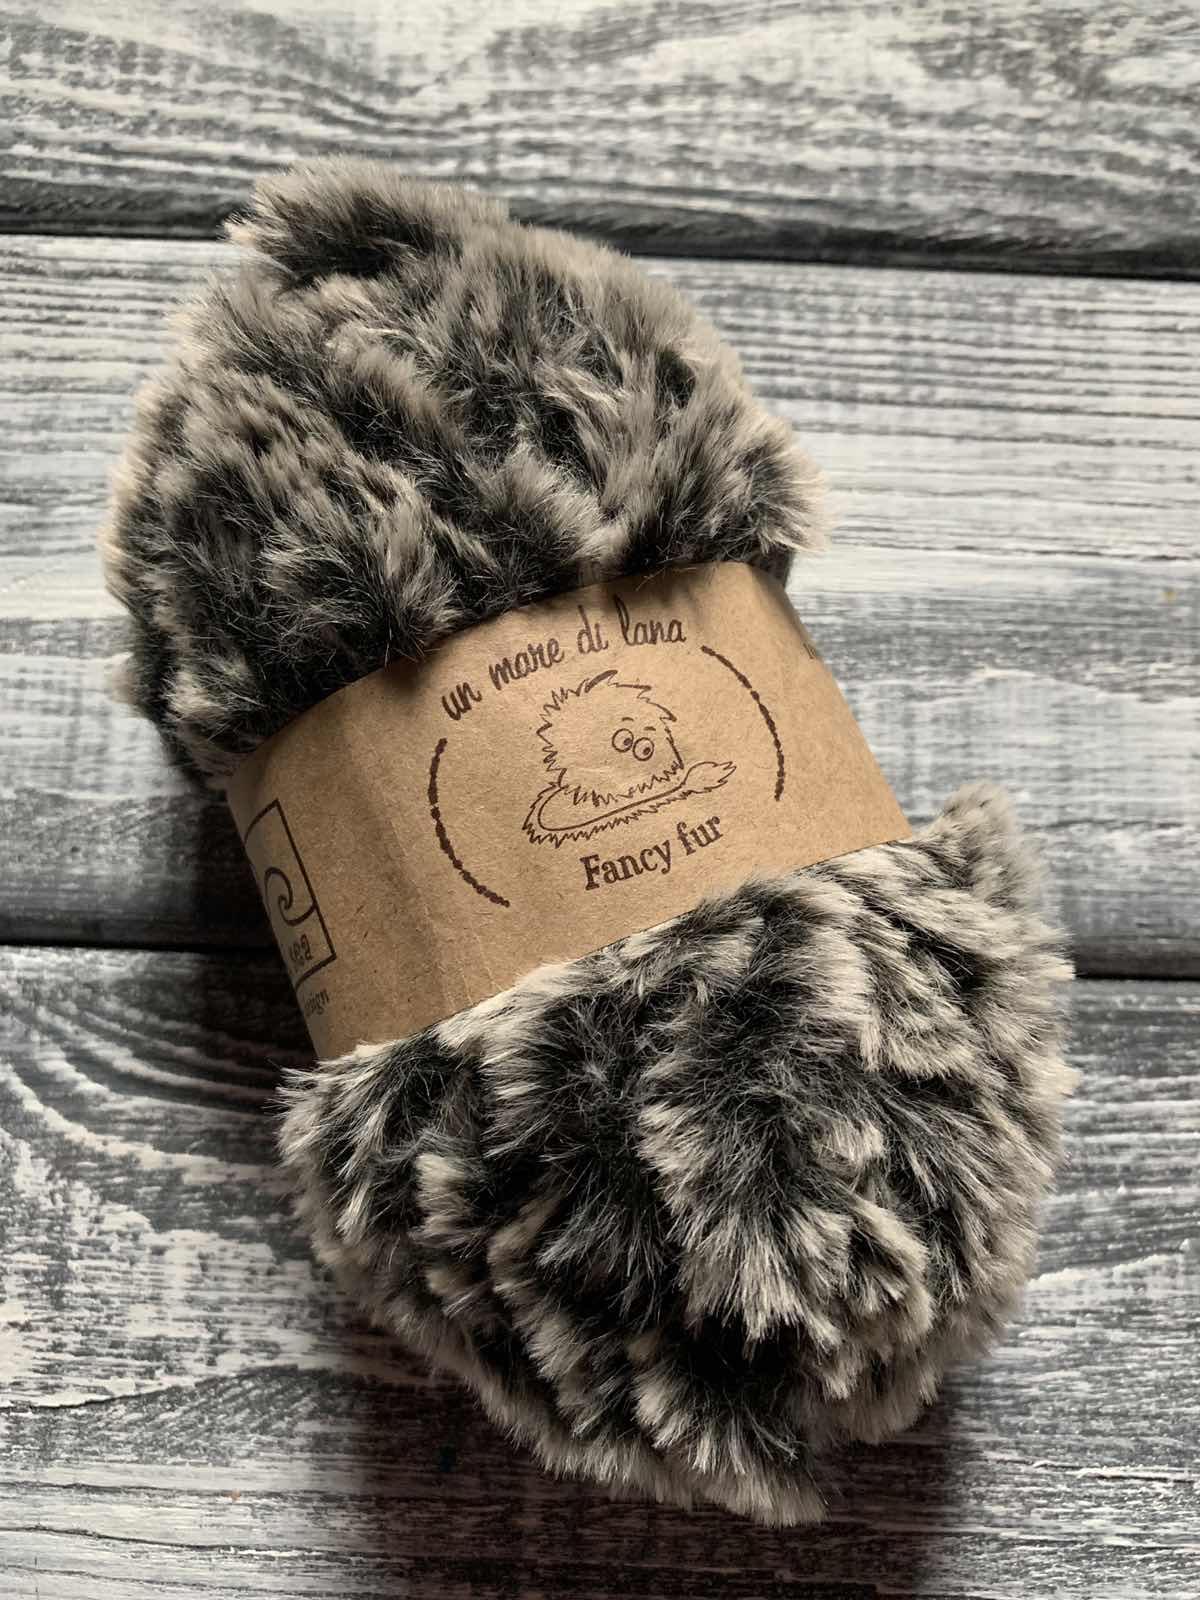 Wool Sea Fancy fur (Море шерсти Фанси фе ) 9991 - черно-серый меланж купить с доставкой по Беларуси